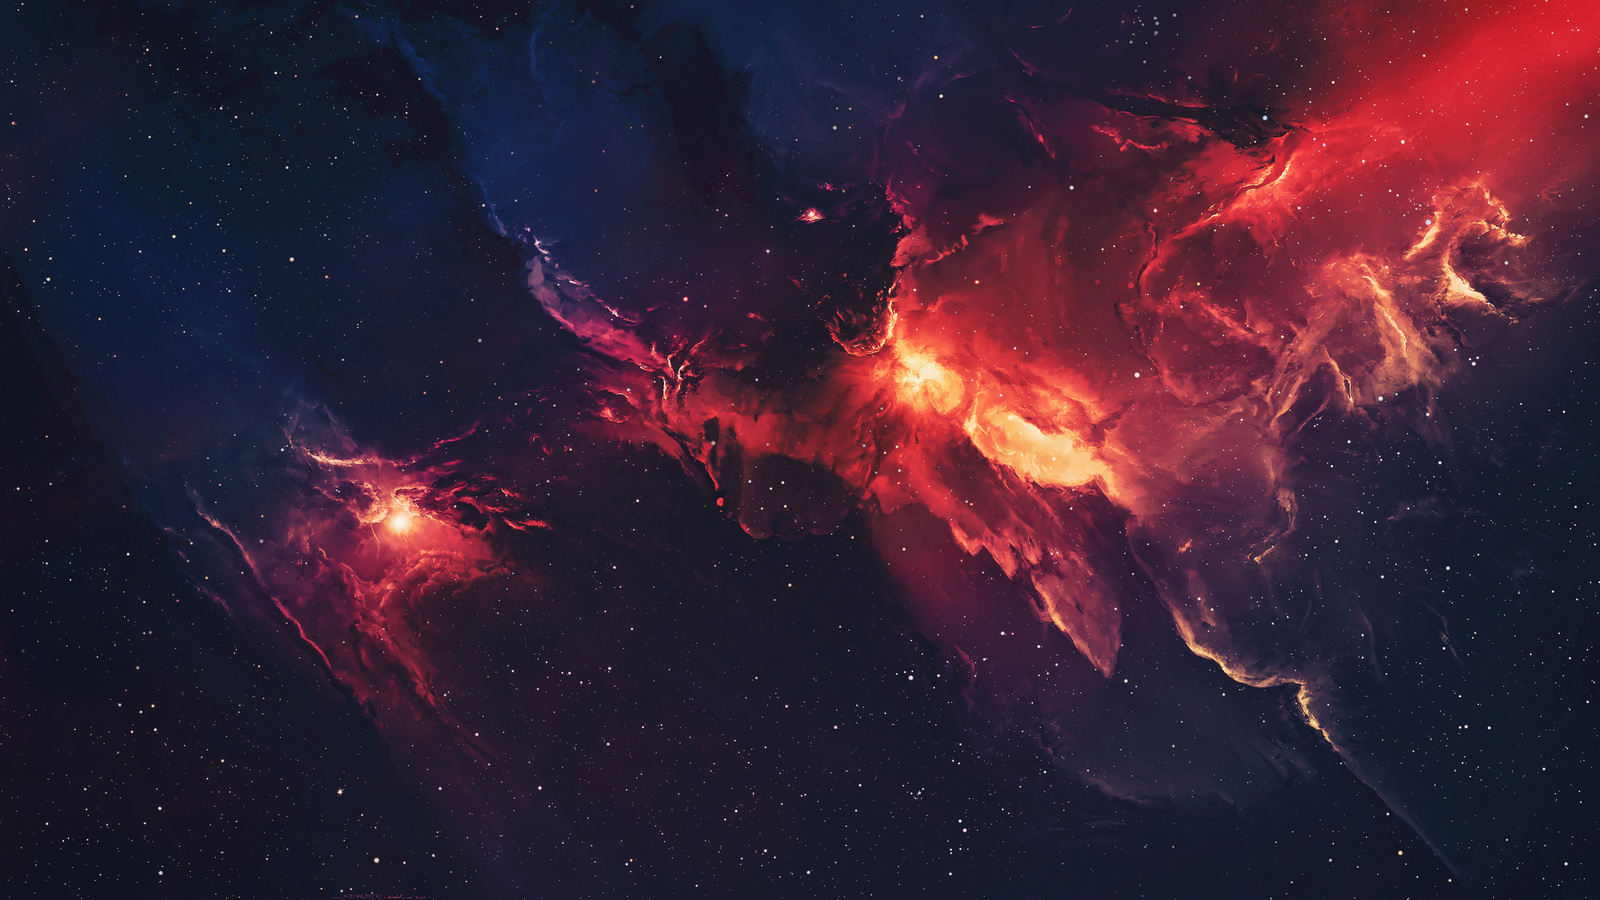 1600x900 galaxy space stars universe nebula 4k 1600x900 - Space wallpaper 1600x900 ...